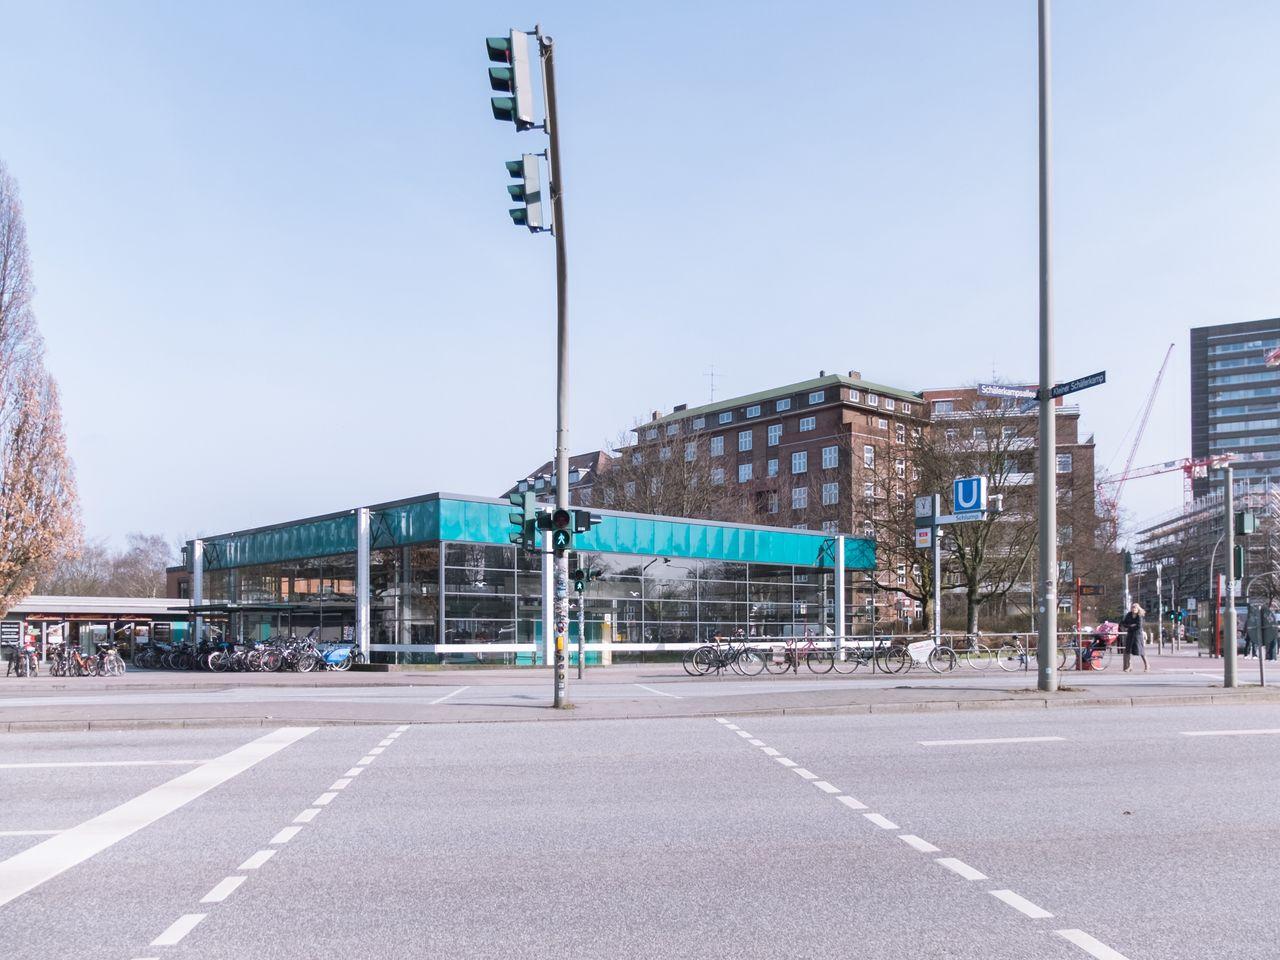 Hamburg City City Life Architecture Architecture_collection Sky Urban Geometry Urbanphotography Urban Exploring